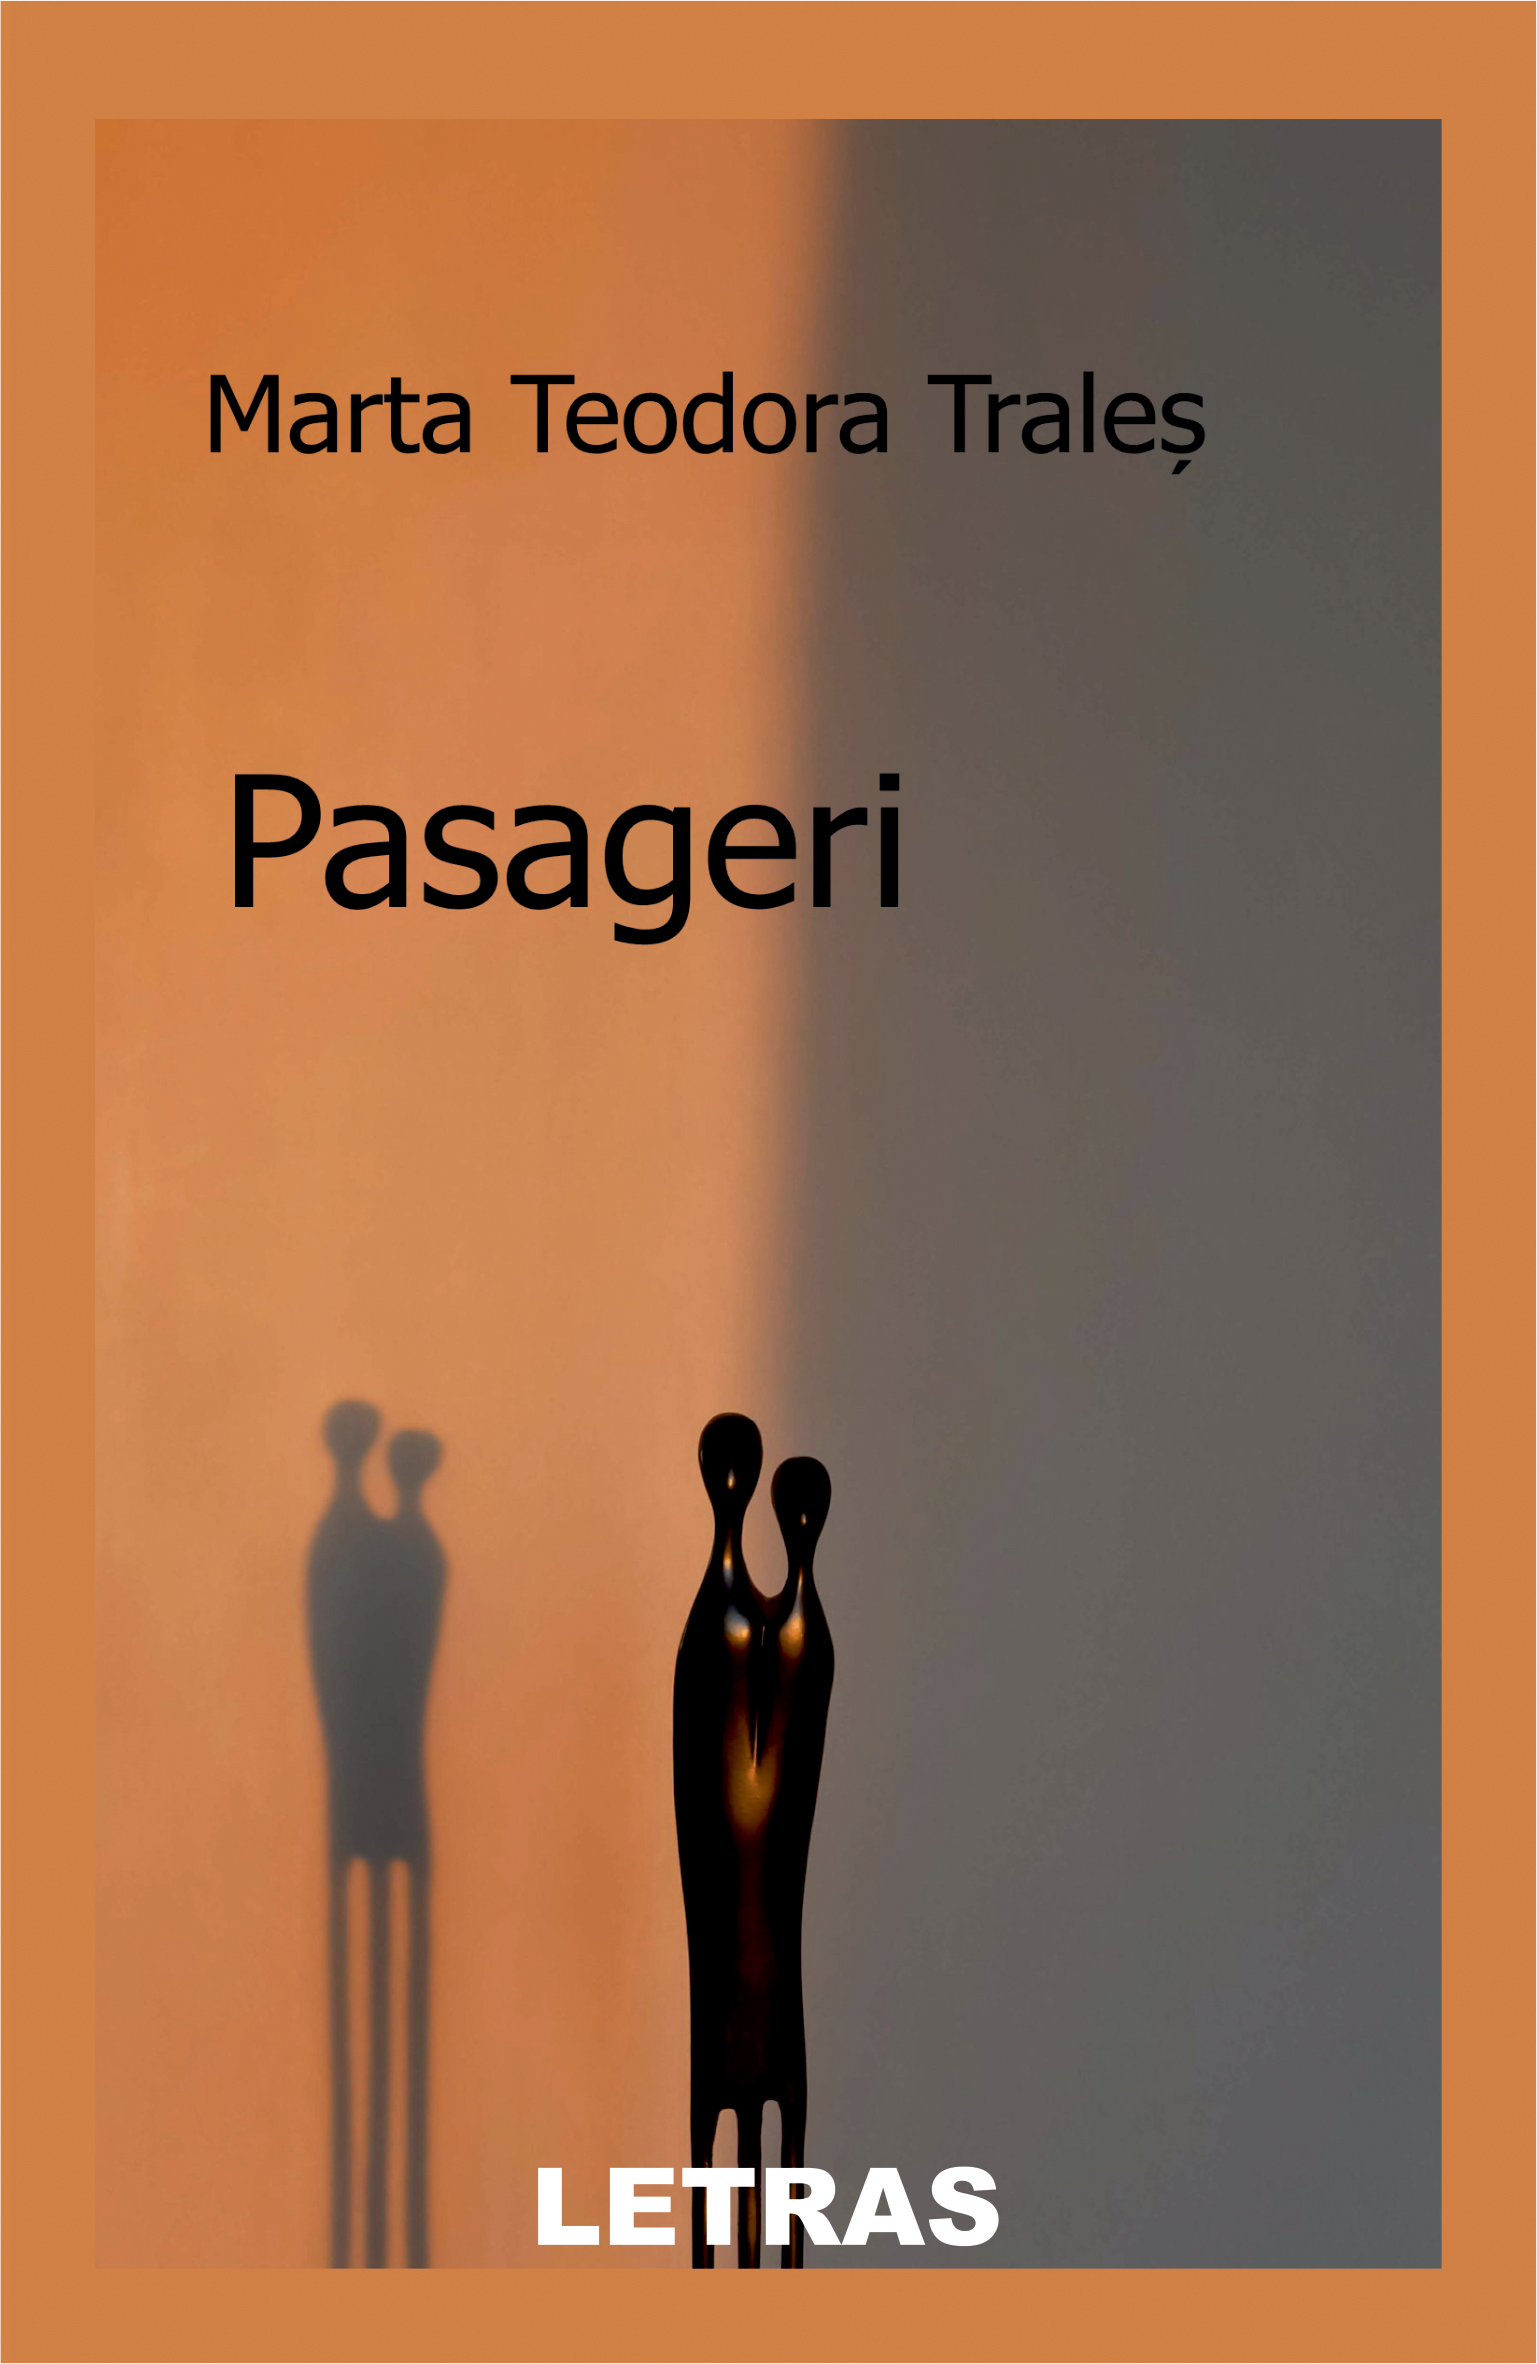 Trales-Maria-Teodora_Pasageri_coperta-1_300-dpi_RGB